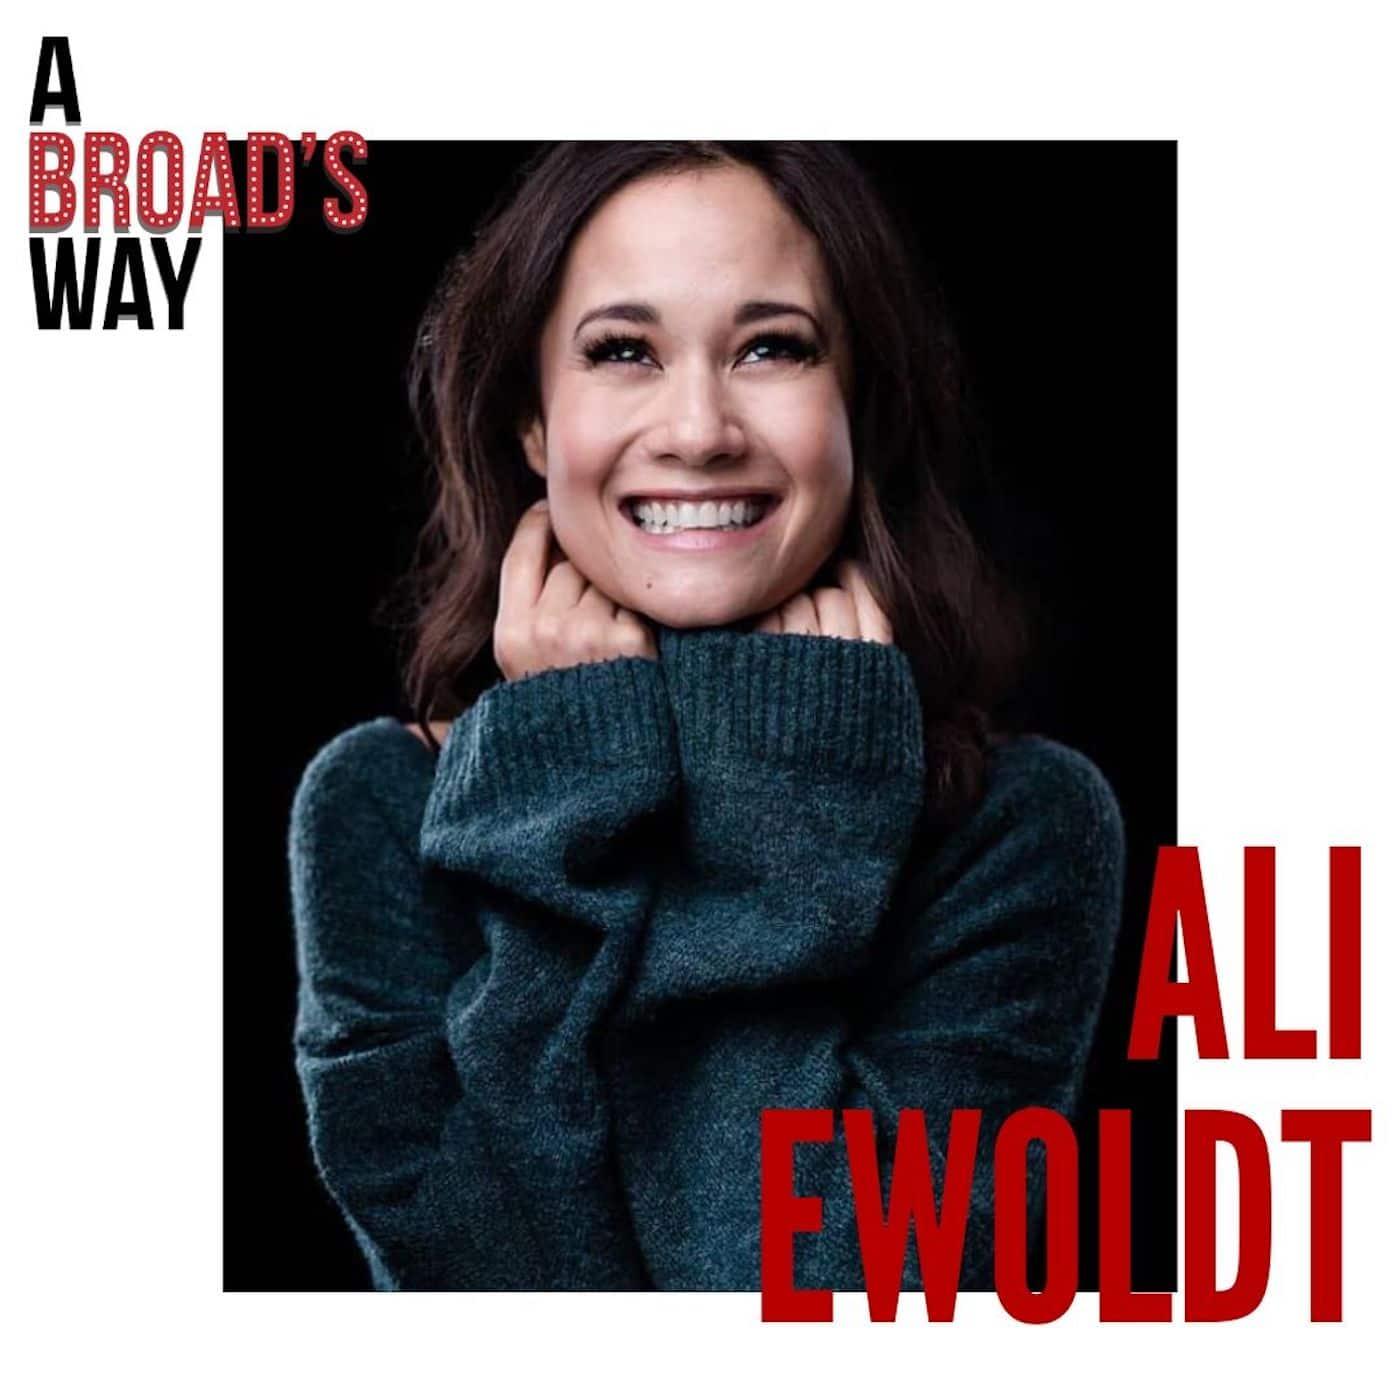 A Broad's Way Episode - Ali-Ewoldt